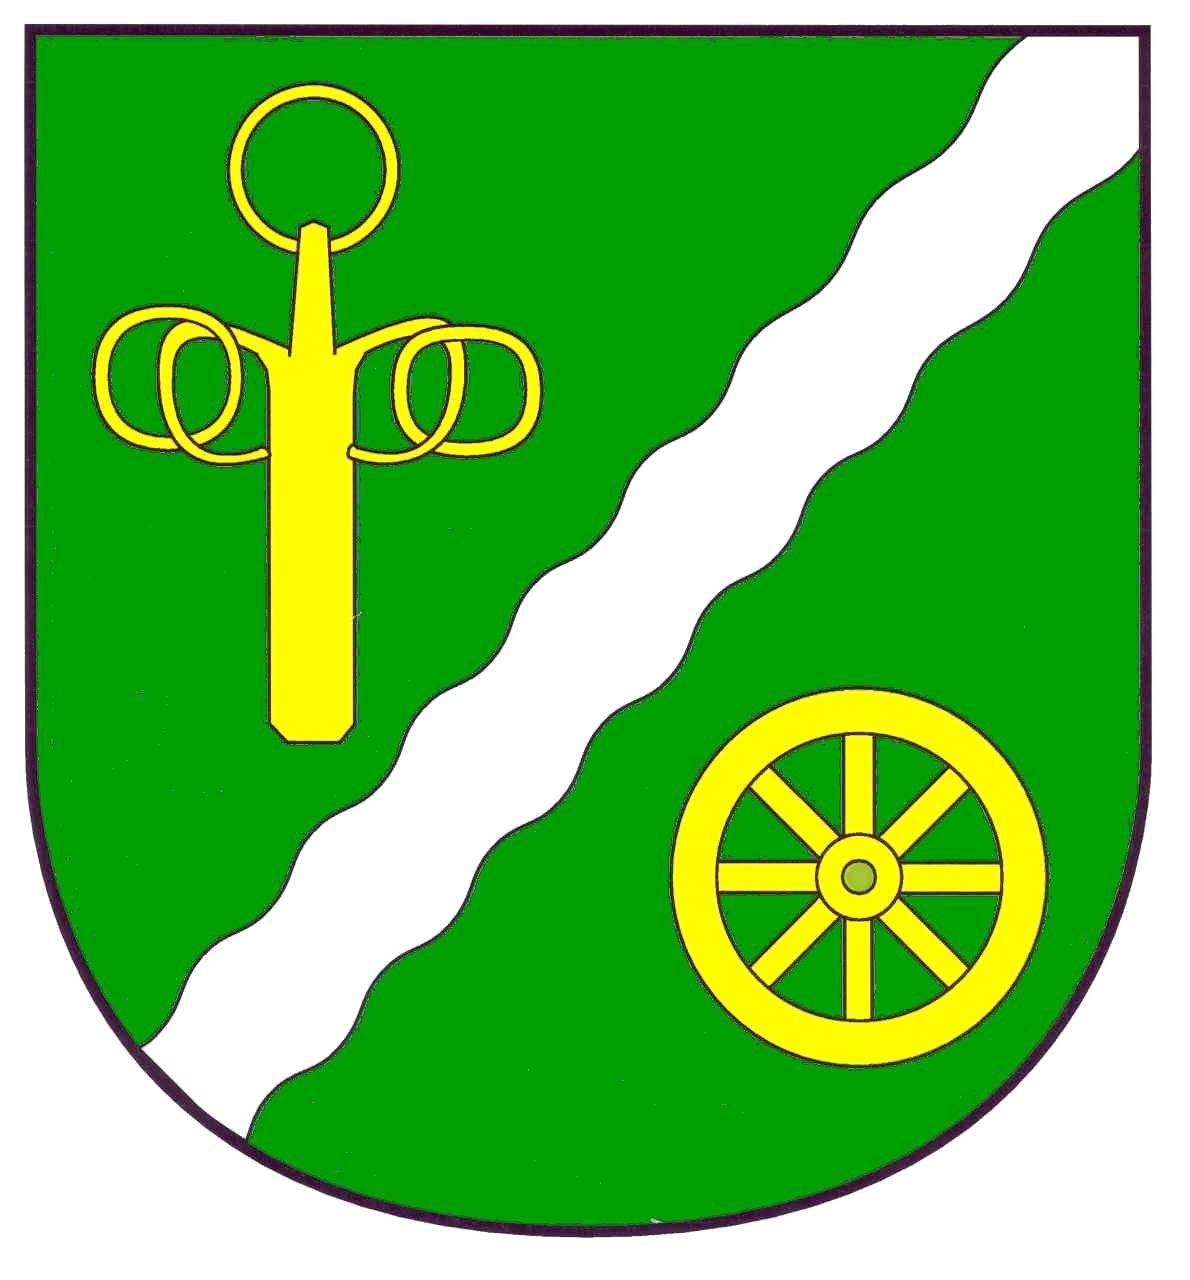 Wappen GemeindeBorgstedt, Kreis Rendsburg-Eckernförde